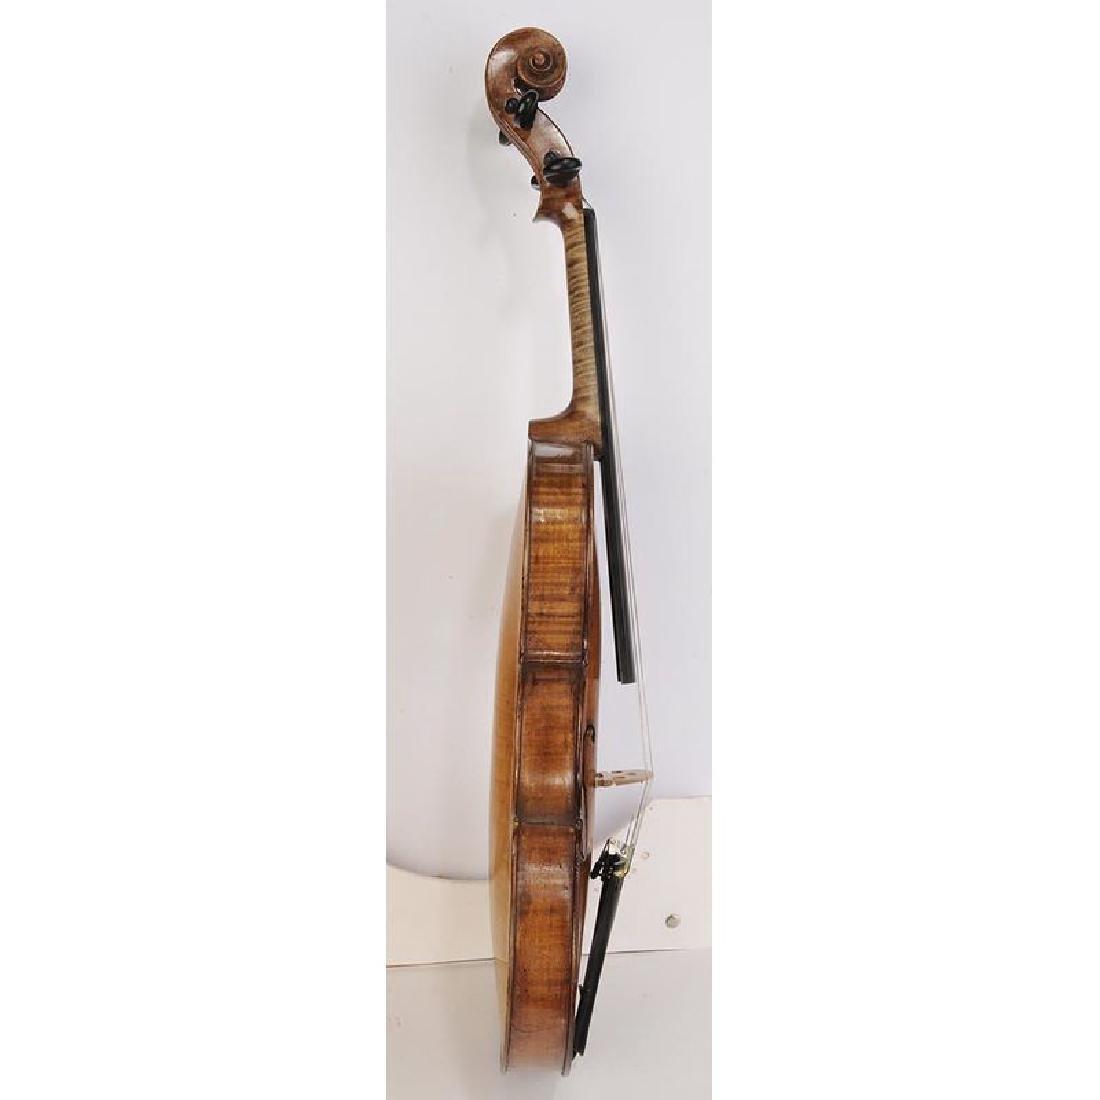 Two Vintage Violins in Cases - 2